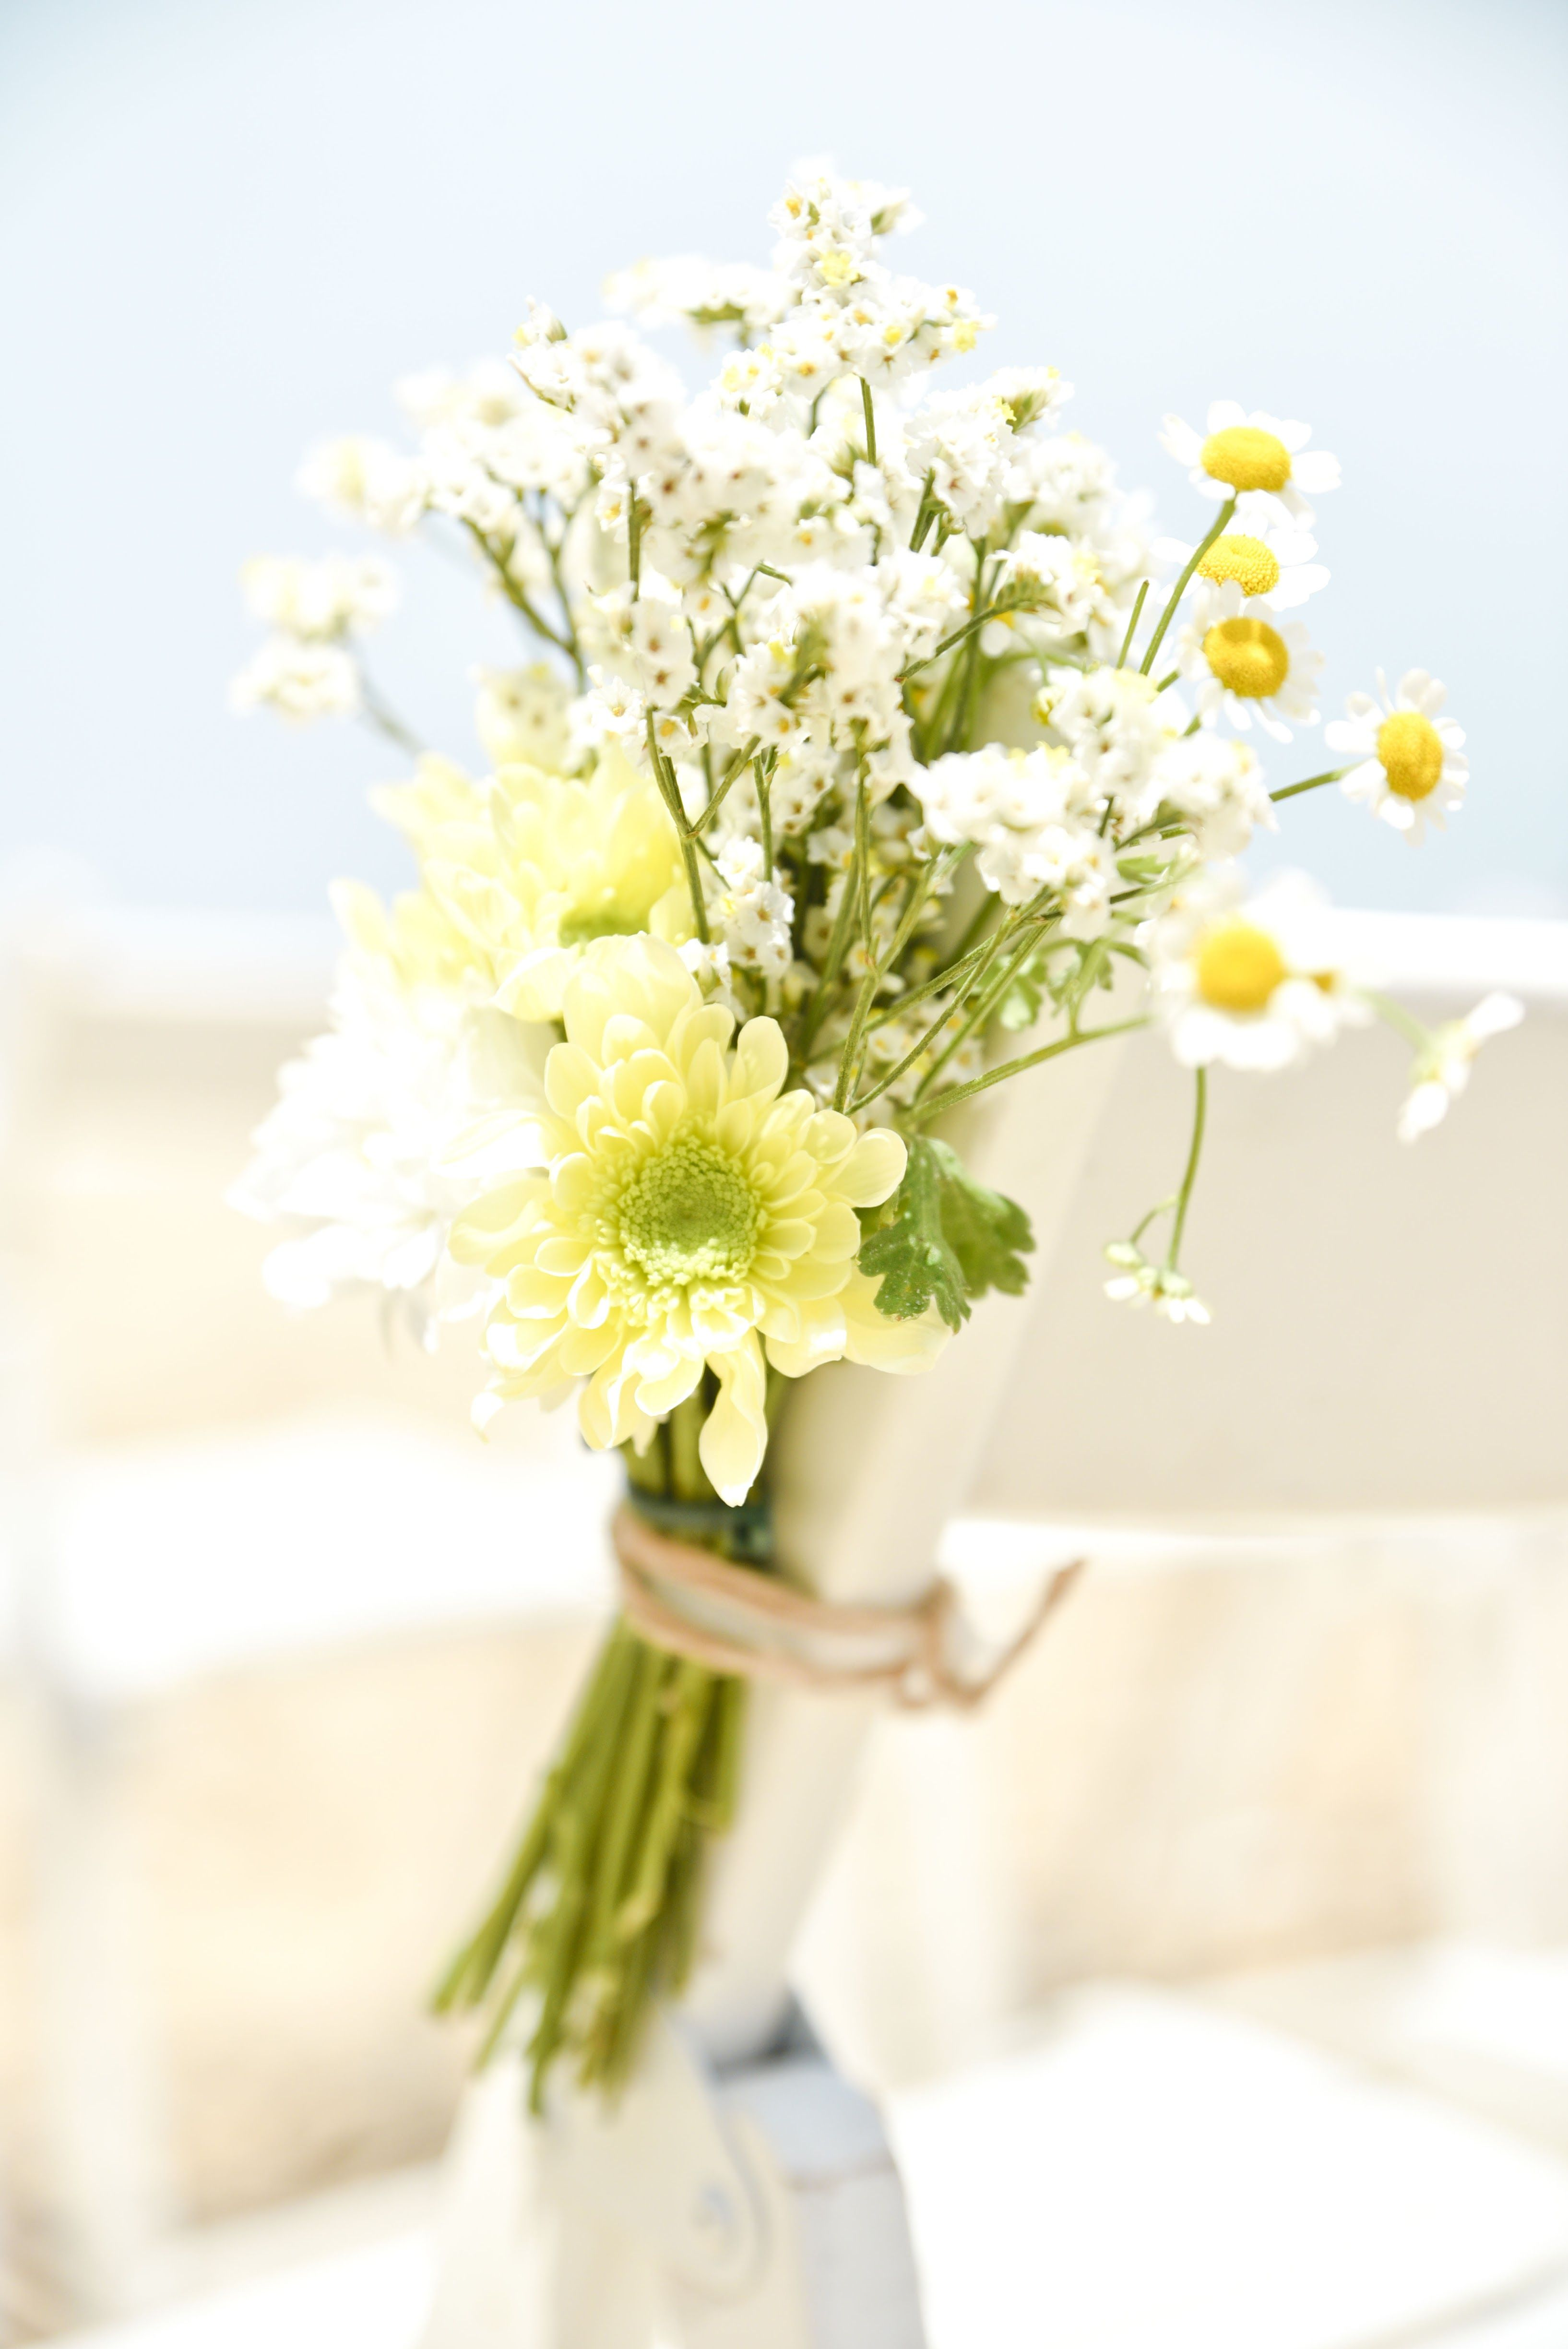 Flower Details - @vweddingportuga #weddinginportugal #vintageweddinginportugal #vintagewedding #portugalwedding #weddingportugal #weddingsinportugal #myvintageweddinginportugal #rusticwedding #rusticweddinginportugal #thequinta #weddinginsintra